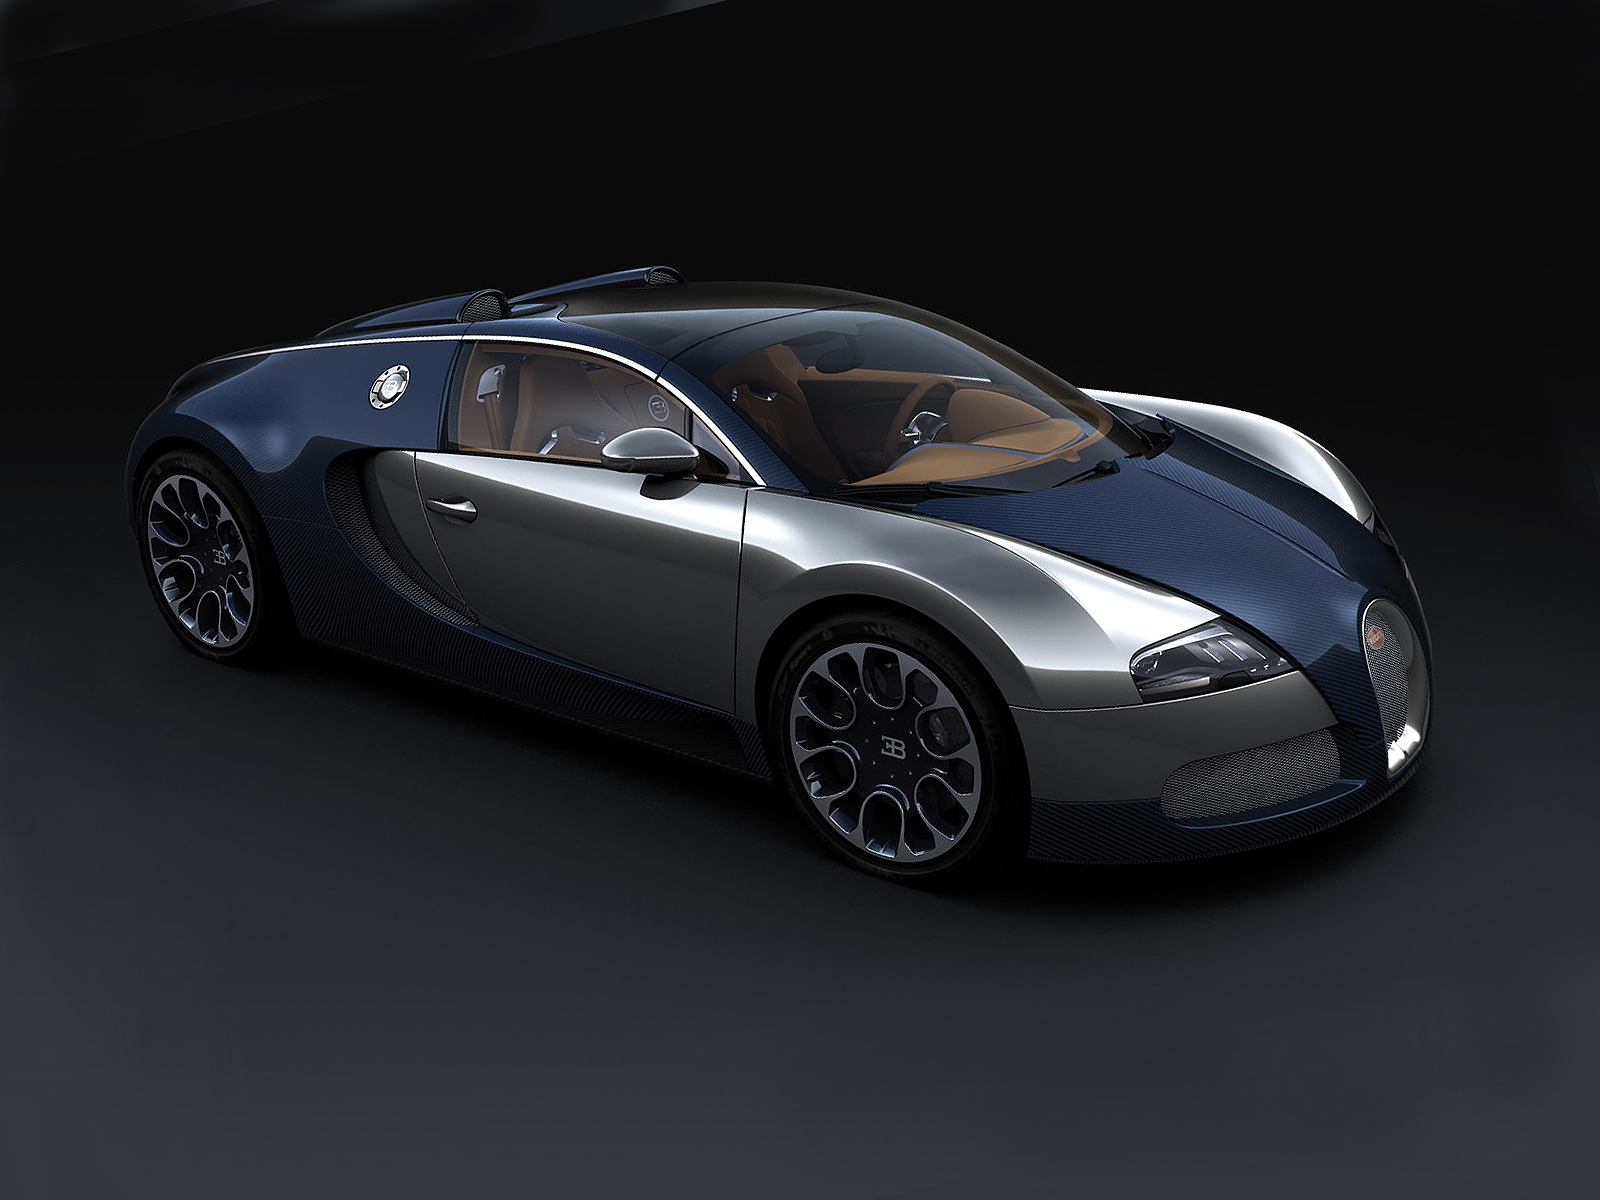 Bugatti-Veyron-Sang-Bleu-04 Gorgeous Bugatti Veyron Grand Sport Vitesse Bleu Cars Trend